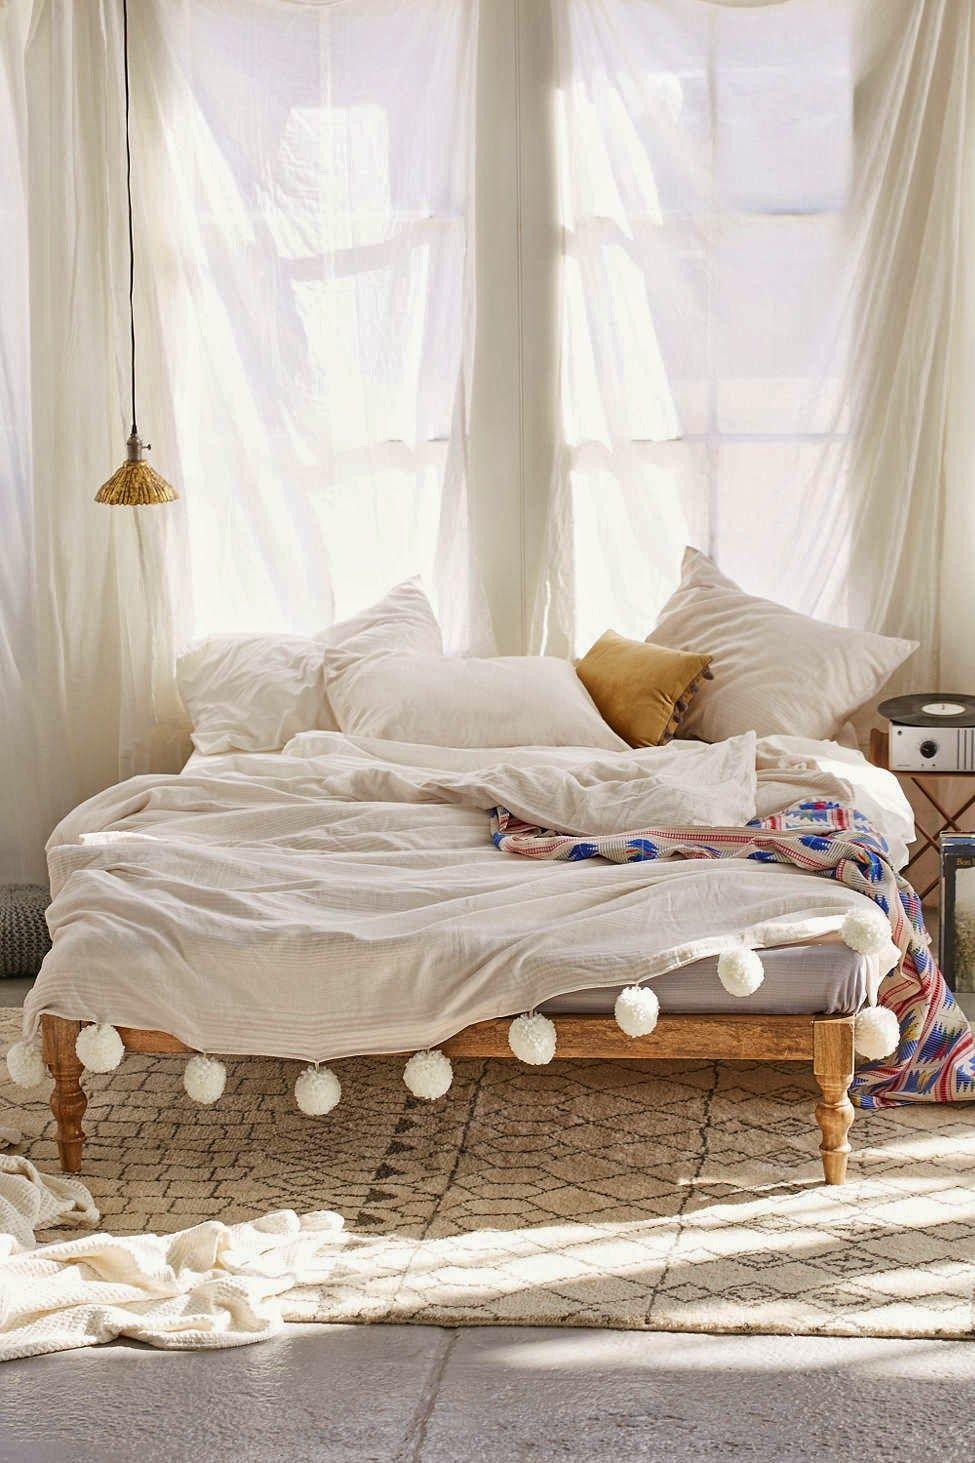 Dreamy Rustic Bedroom Daily Dream Decor